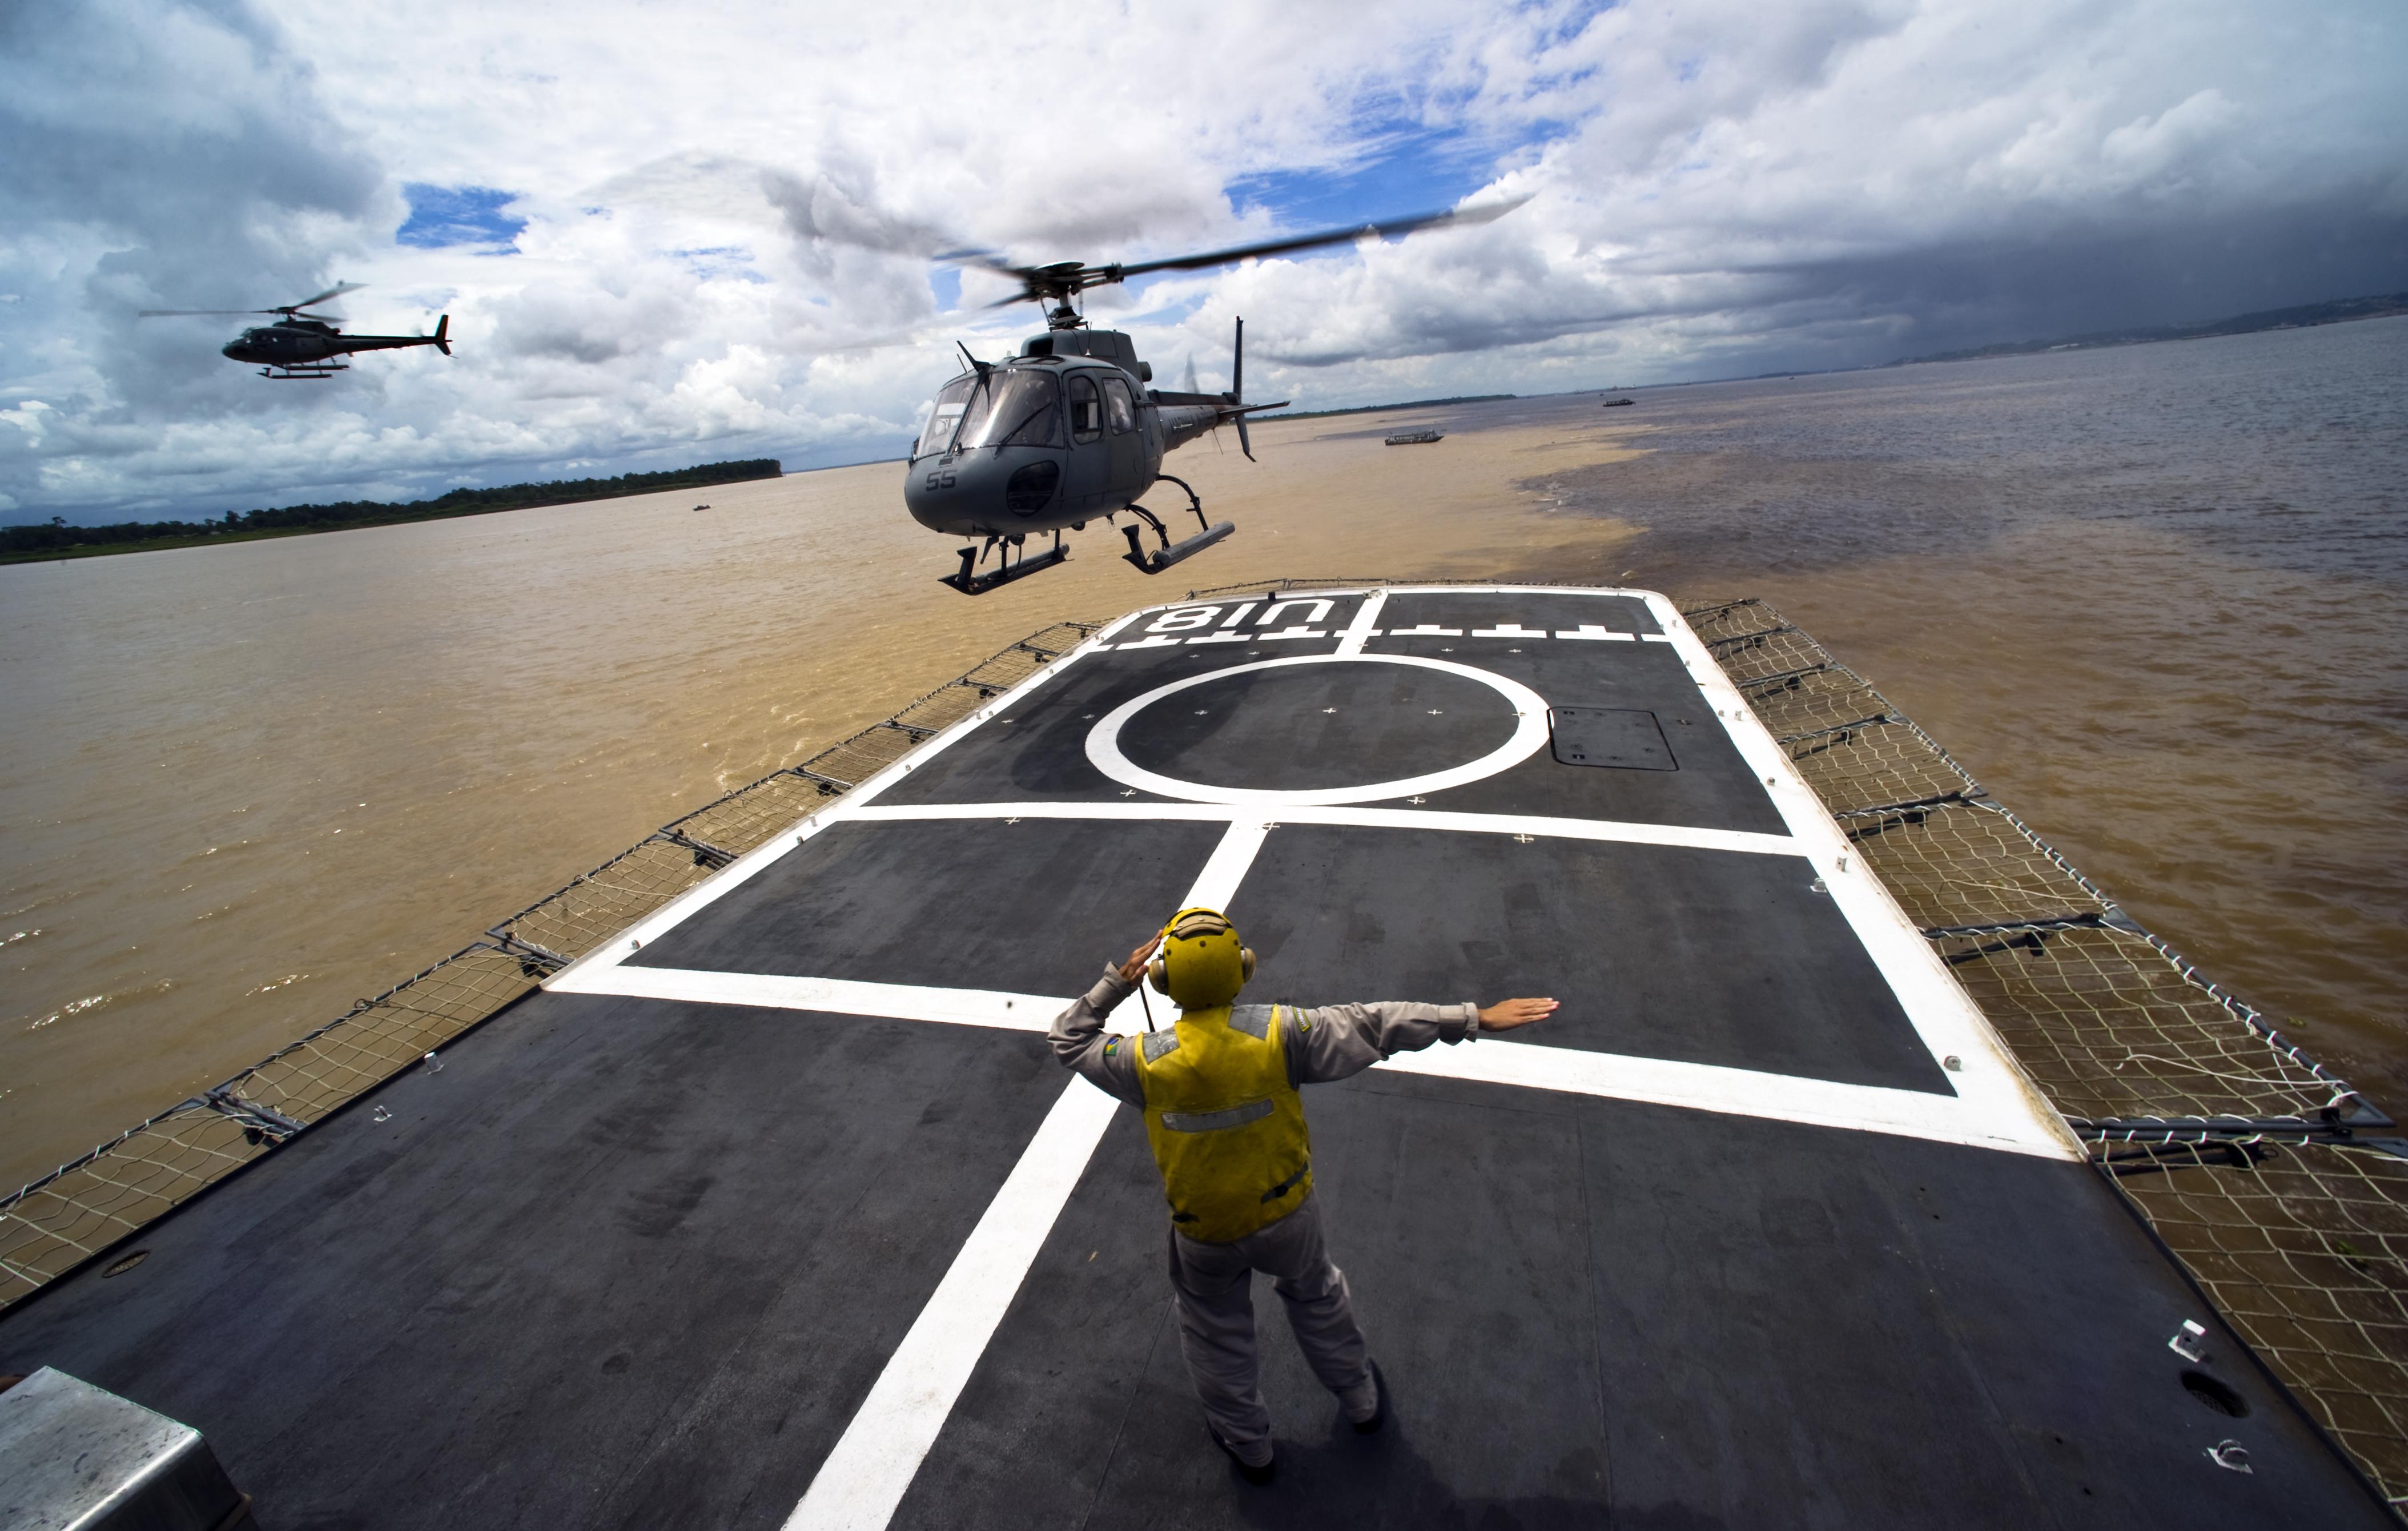 Flickr - Official U.S. Navy Imagery - Eurocopter transports Navy secretary onto Brazilian navy hospital ship.